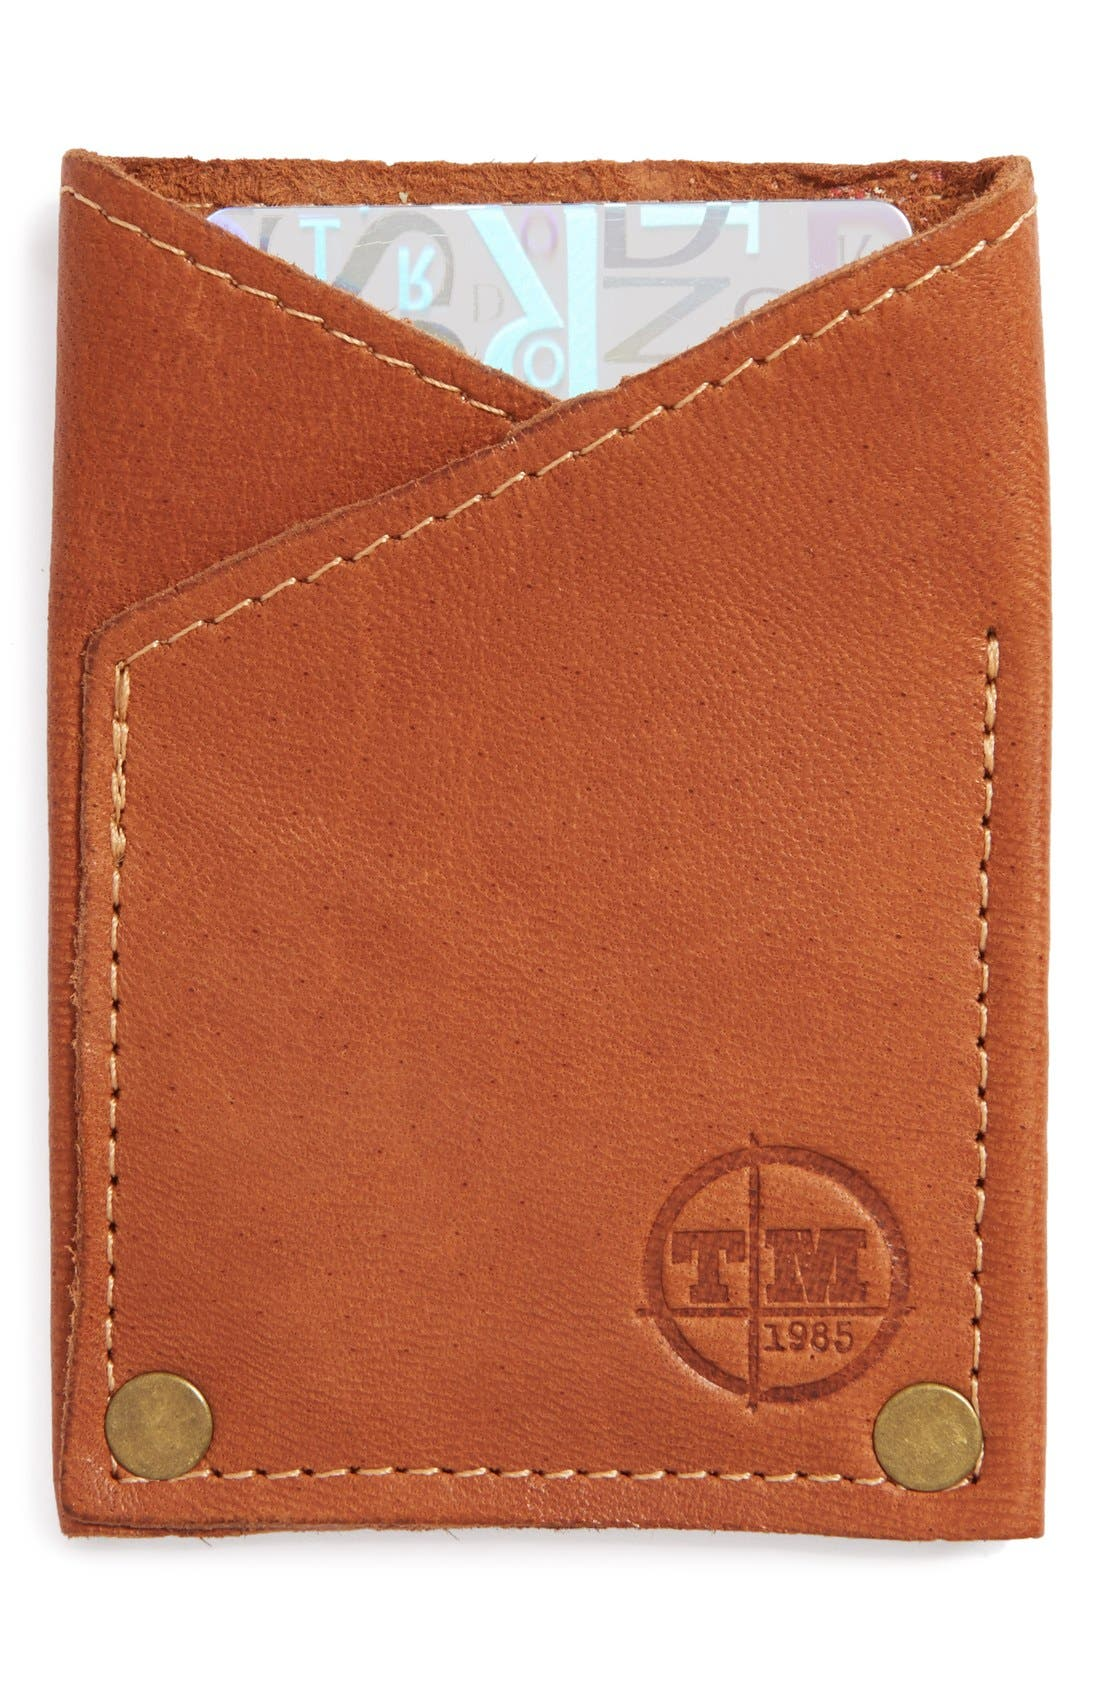 Main Image - TM1985 Card Wallet